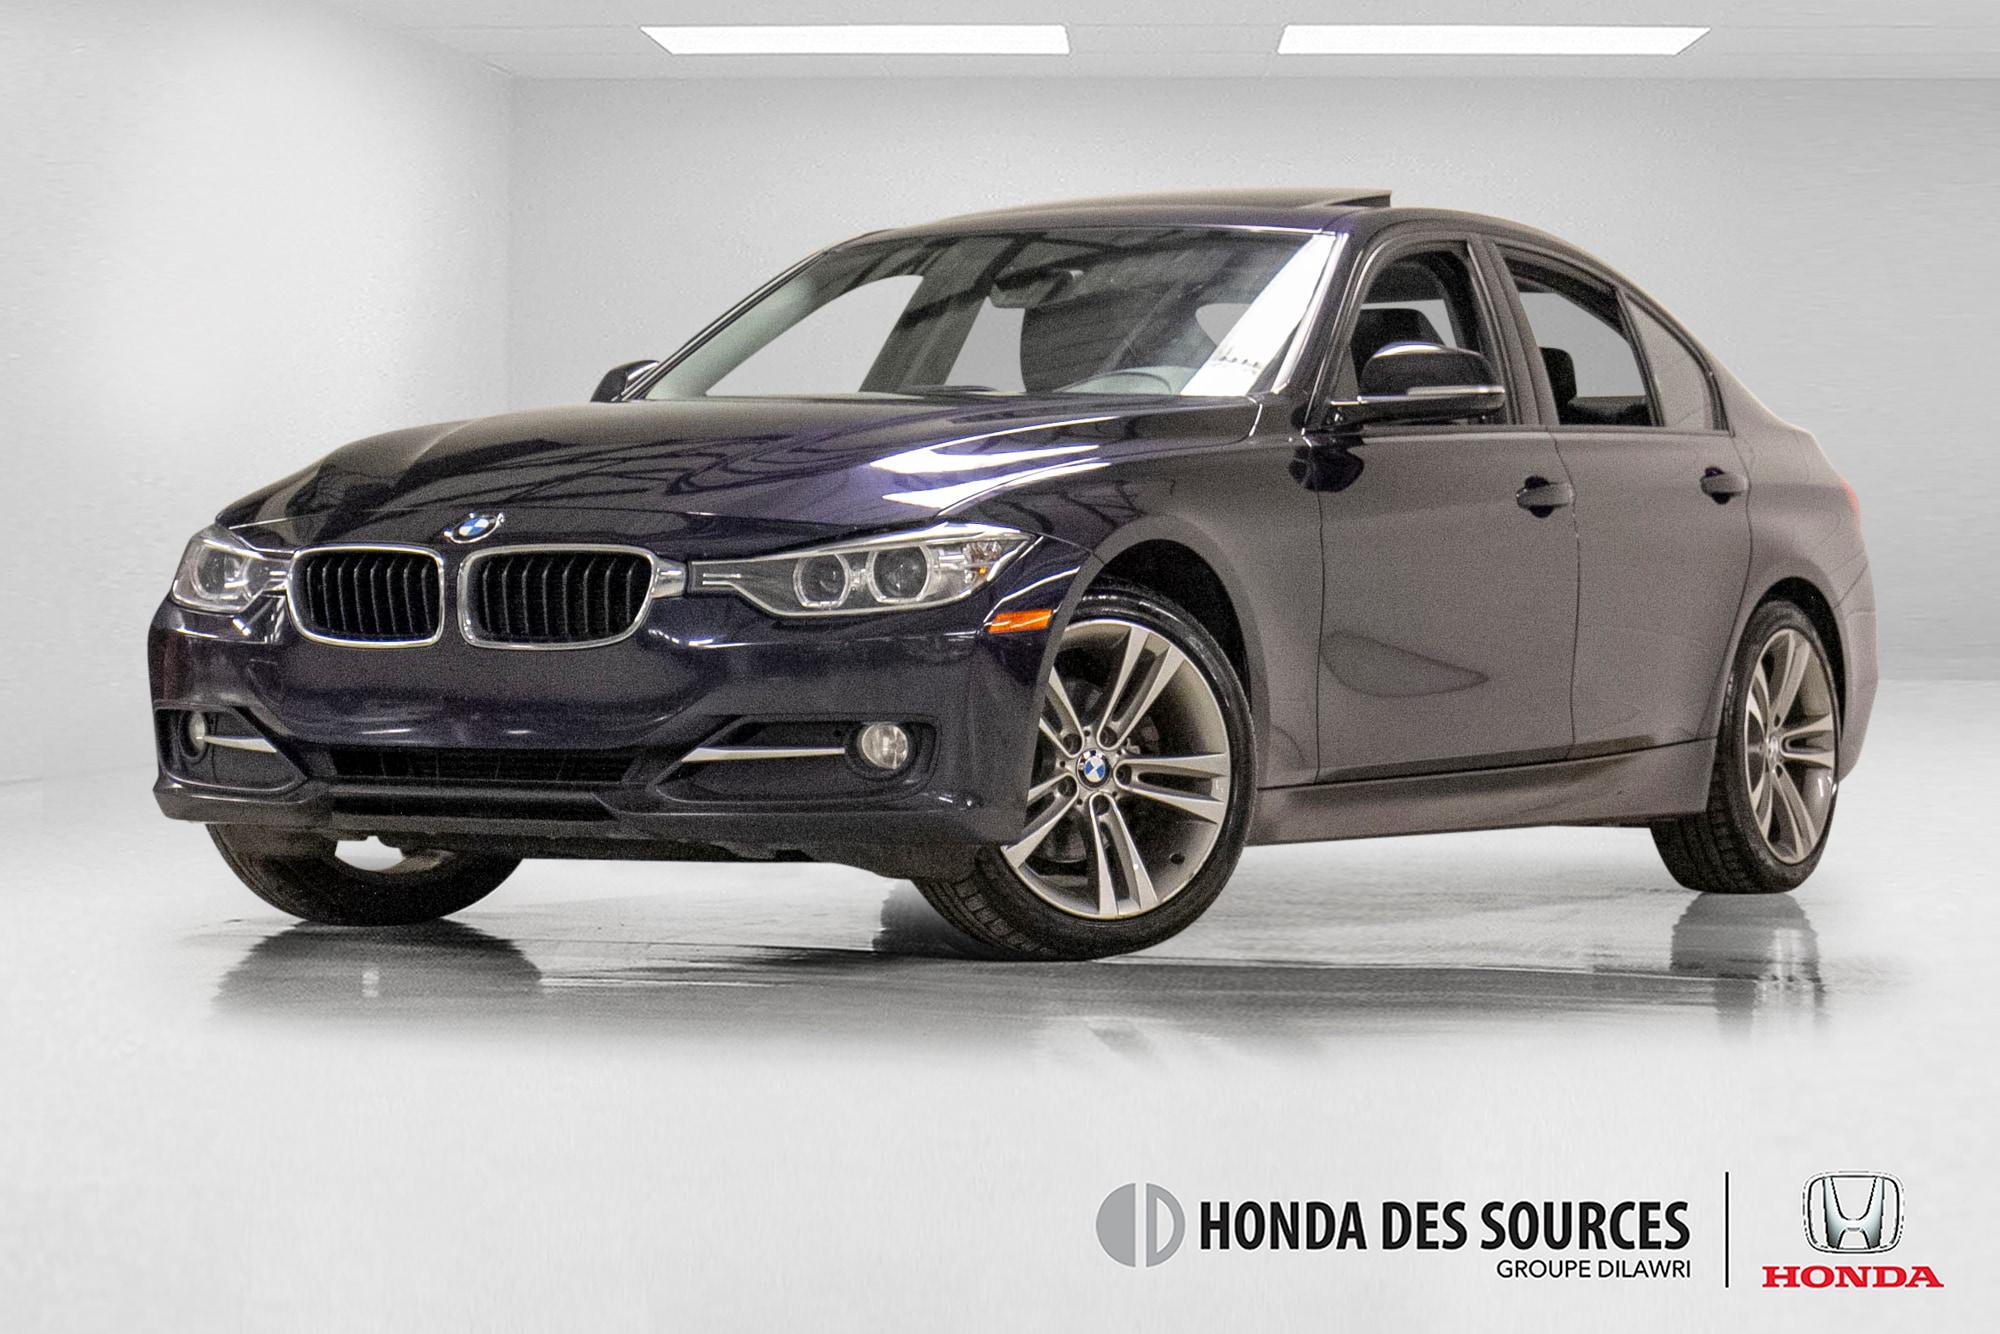 2014 BMW 320I Xdrive  * Xdrive * Bas Kilometrage* Berline